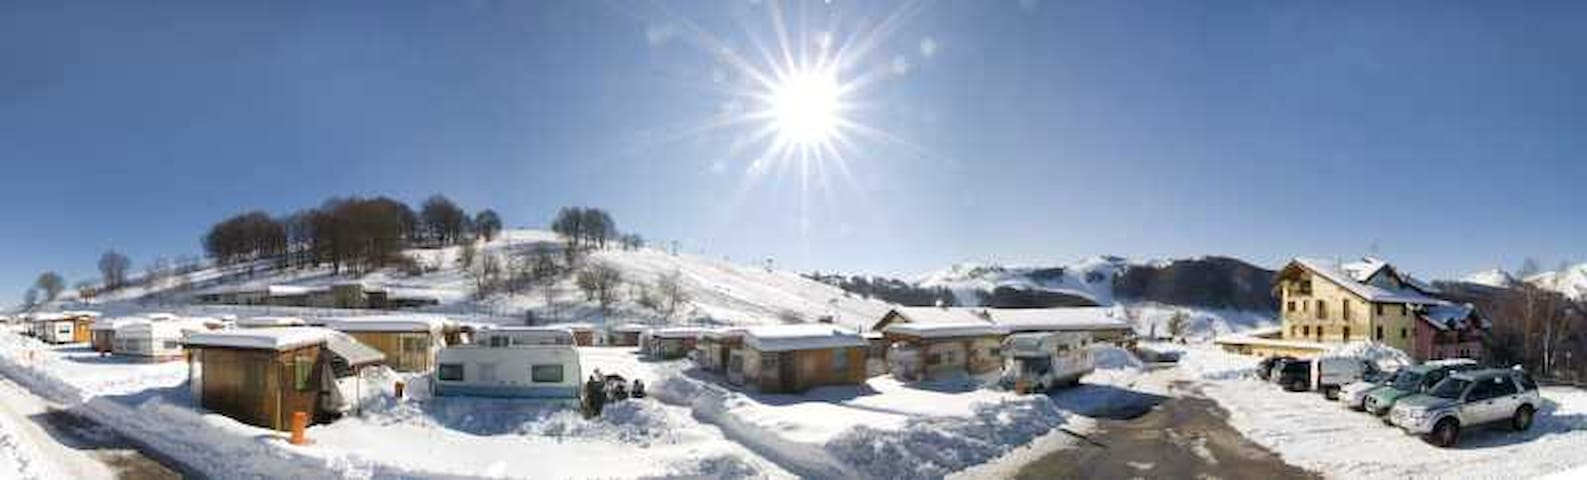 Piazzola in camping per camper e roulotte - Brentonico